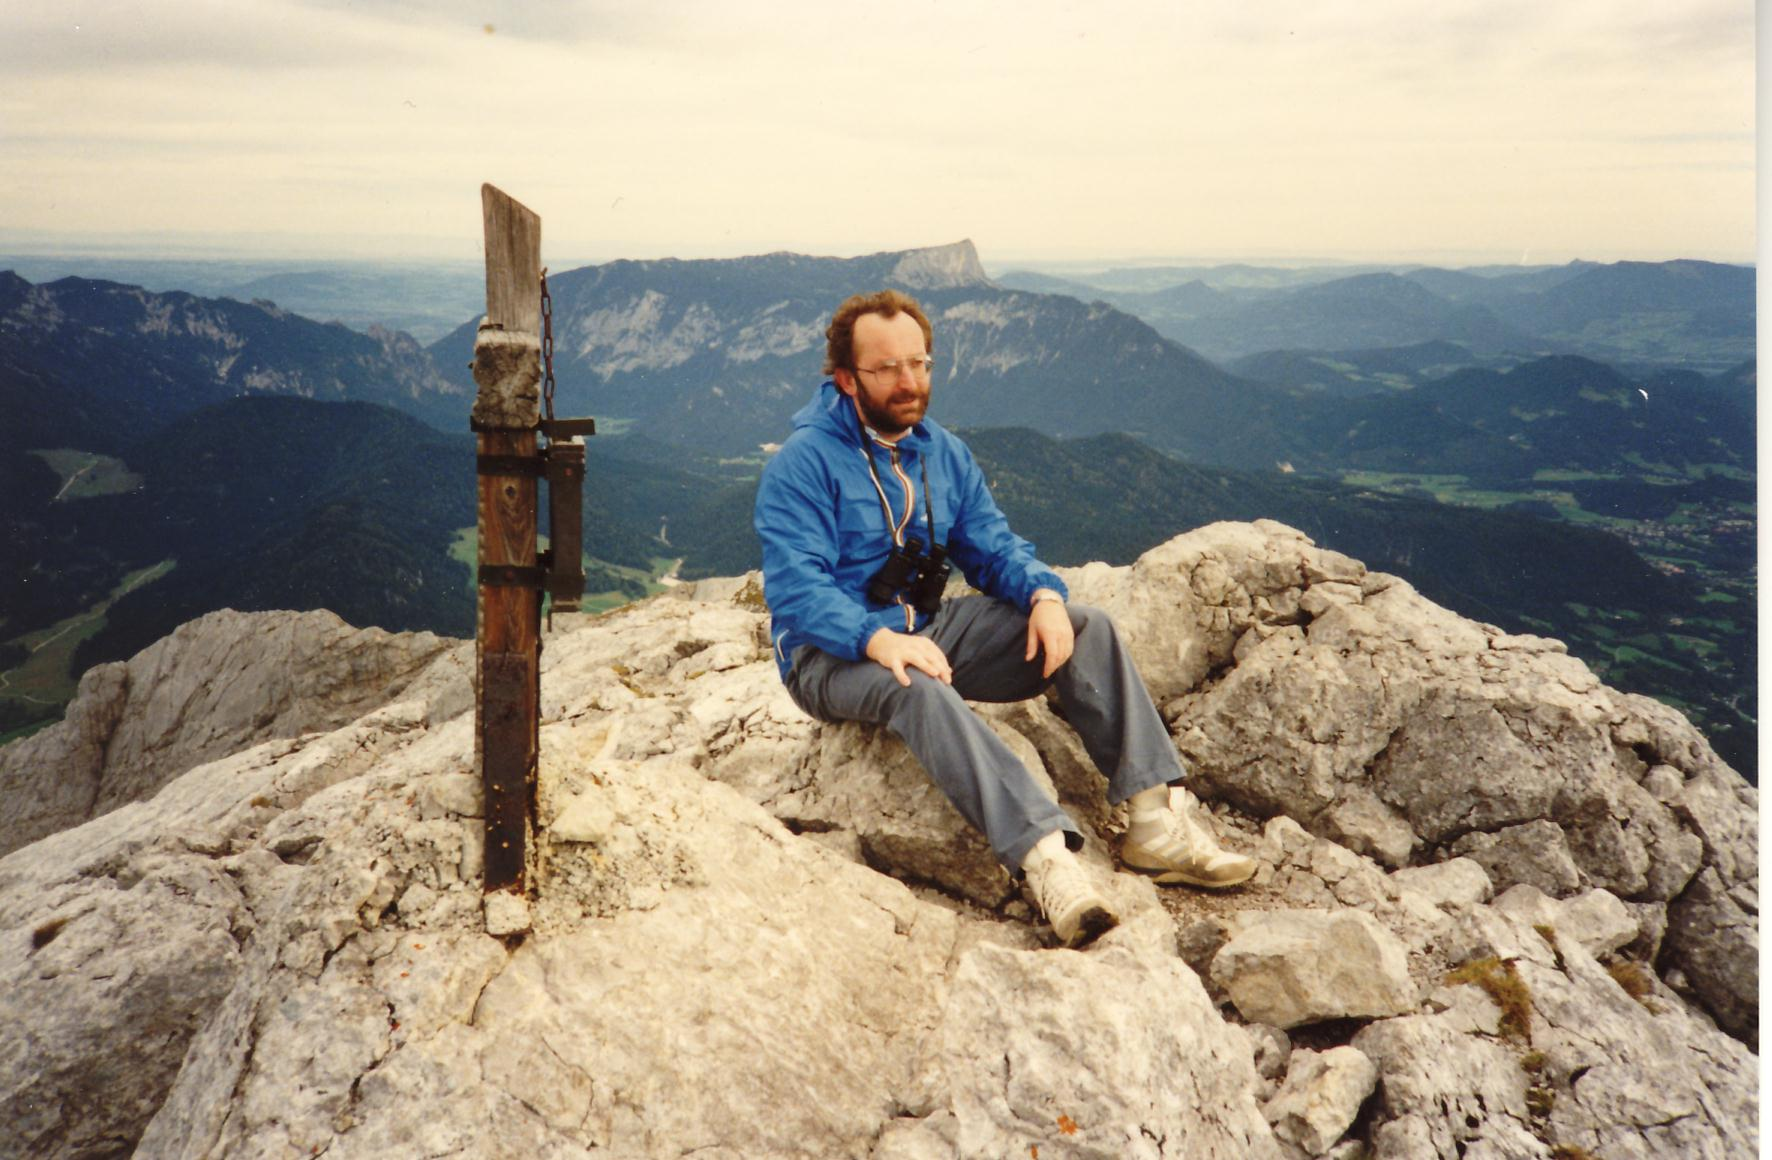 Berchtesgaden-Ramsau-Watzmann